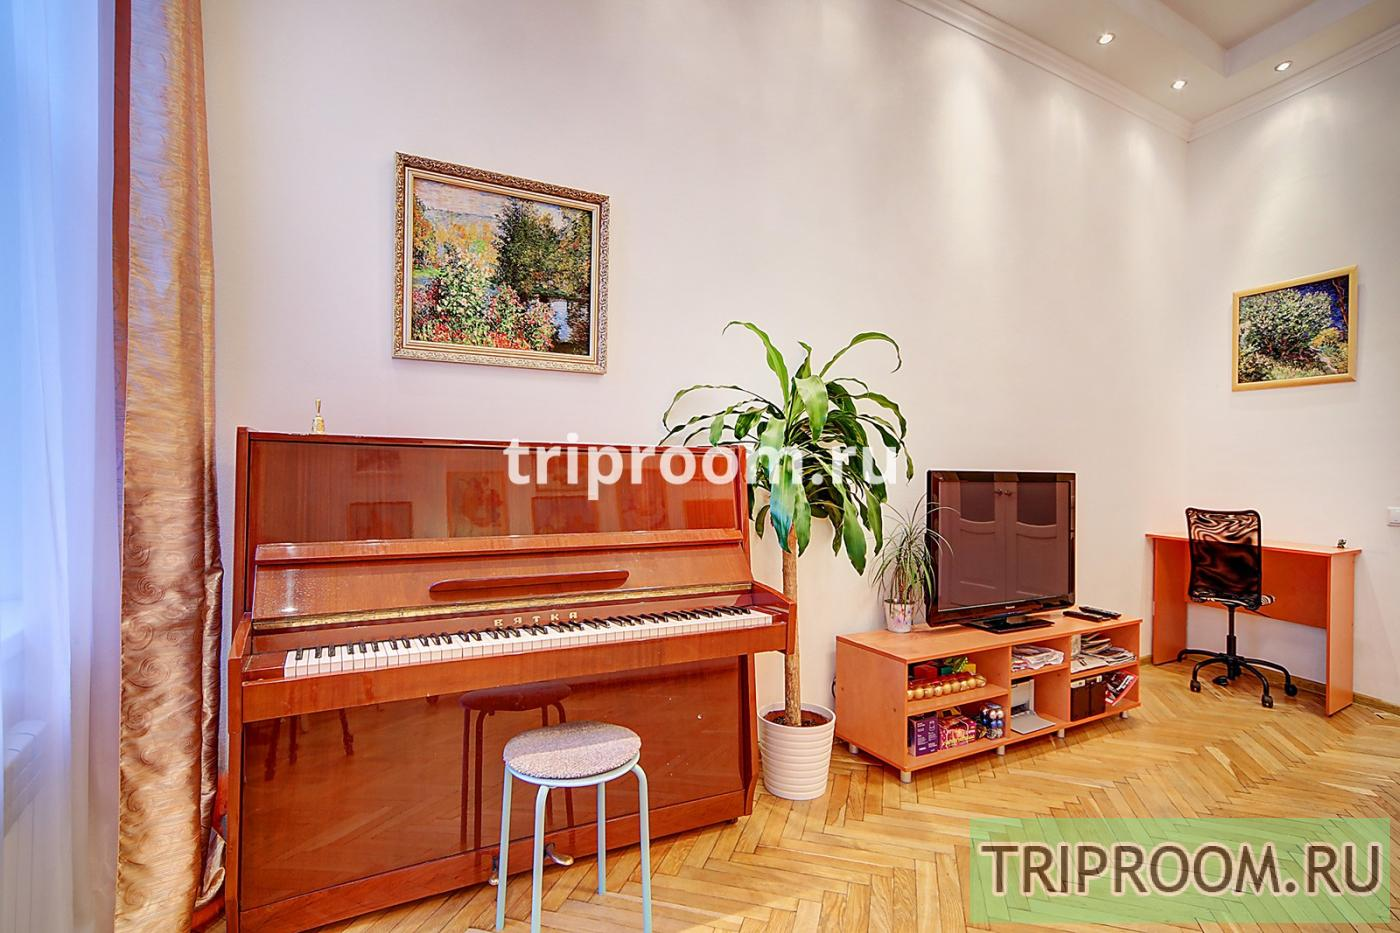 2-комнатная квартира посуточно (вариант № 15426), ул. Лиговский проспект, фото № 6